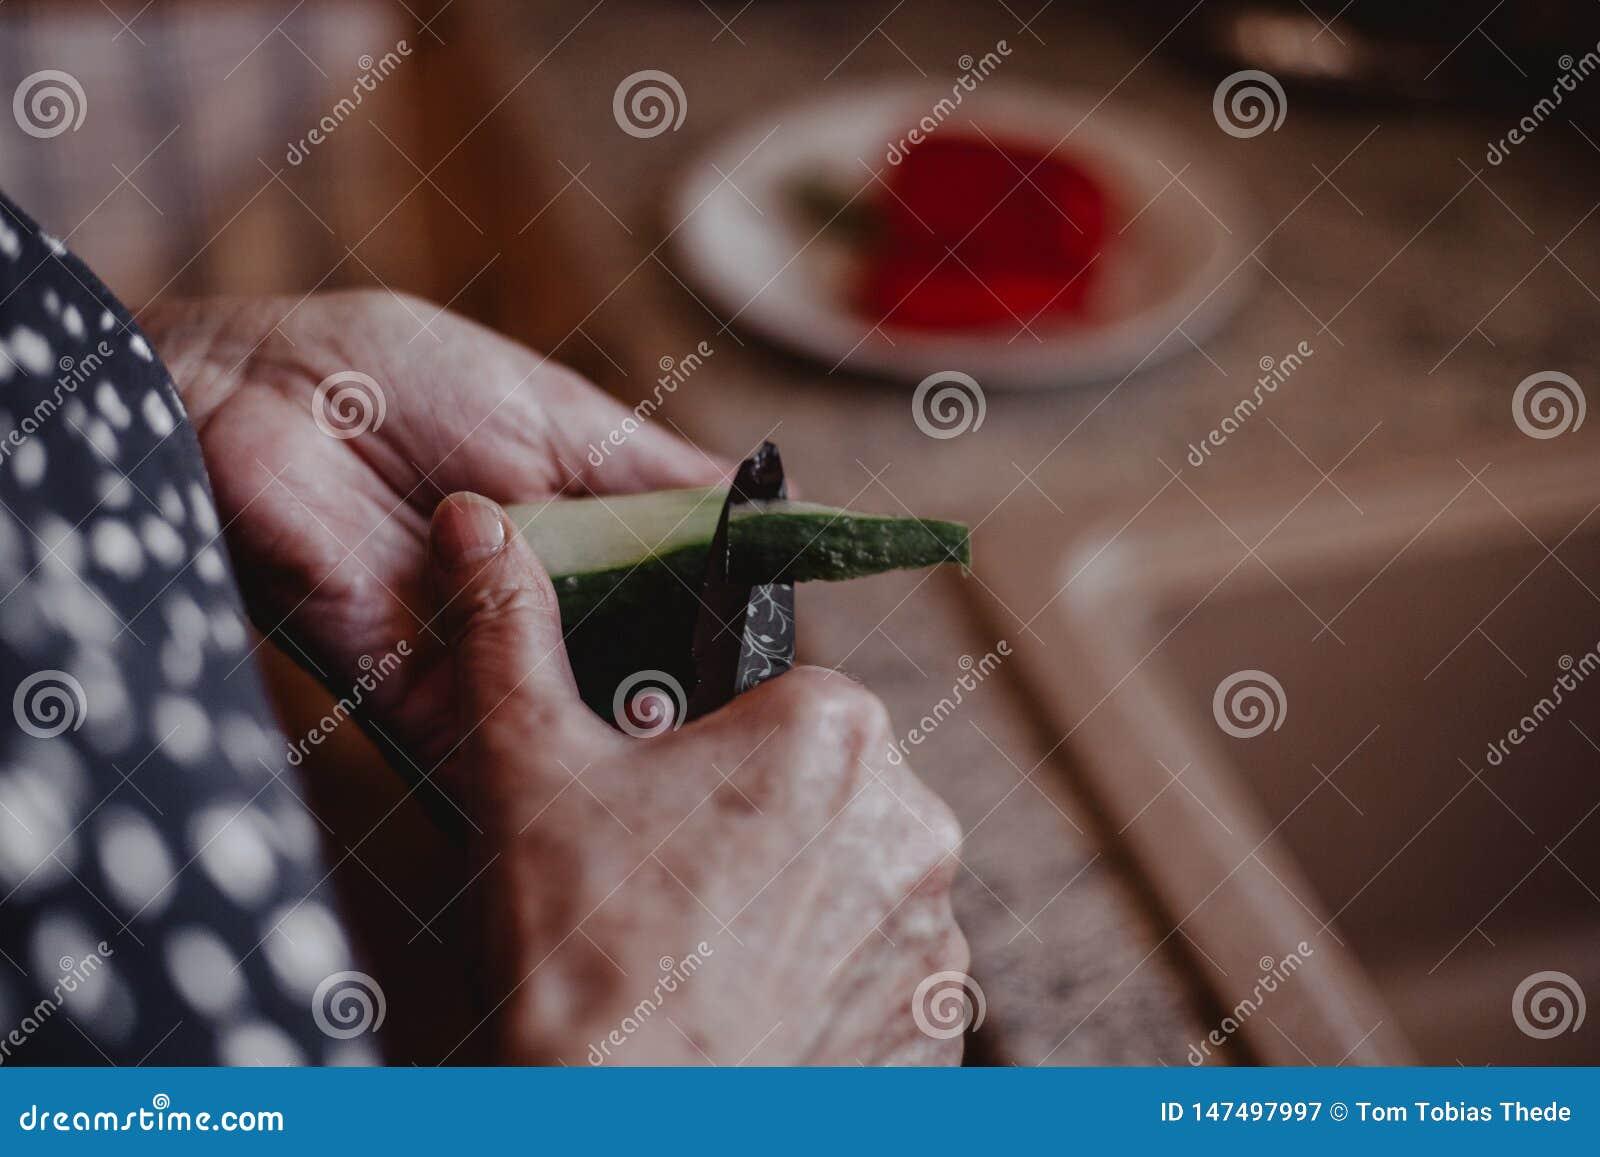 Grandma cutting healthy vegetables in kitchen